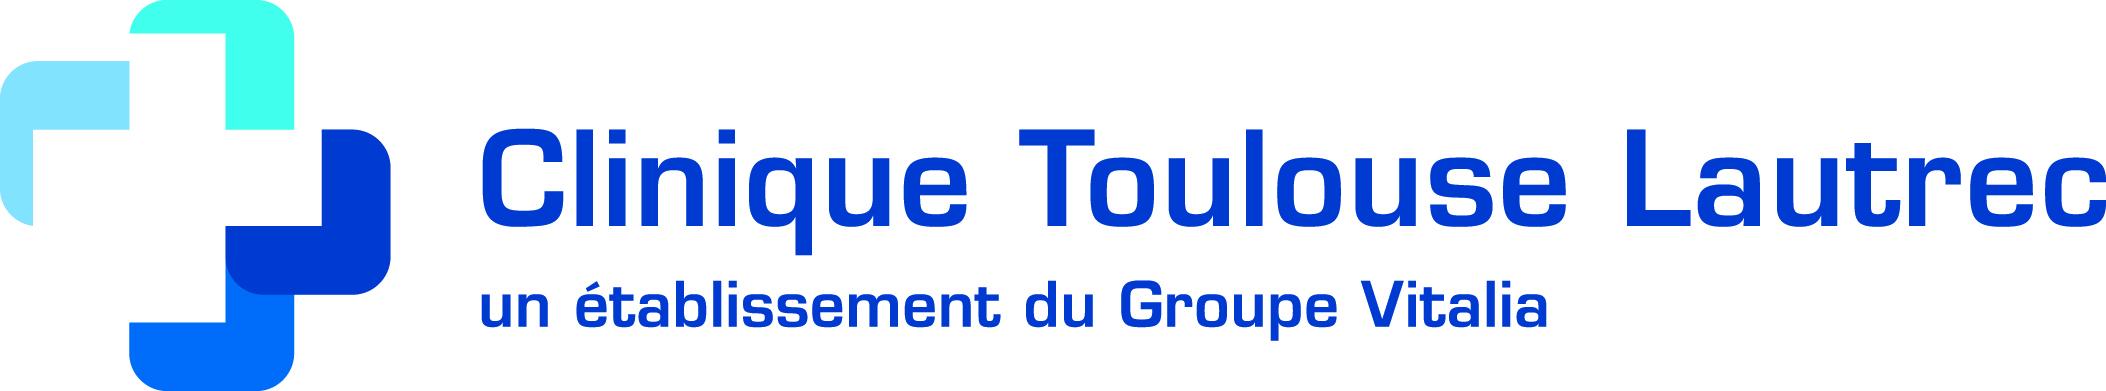 logo Toulouse Lautrec